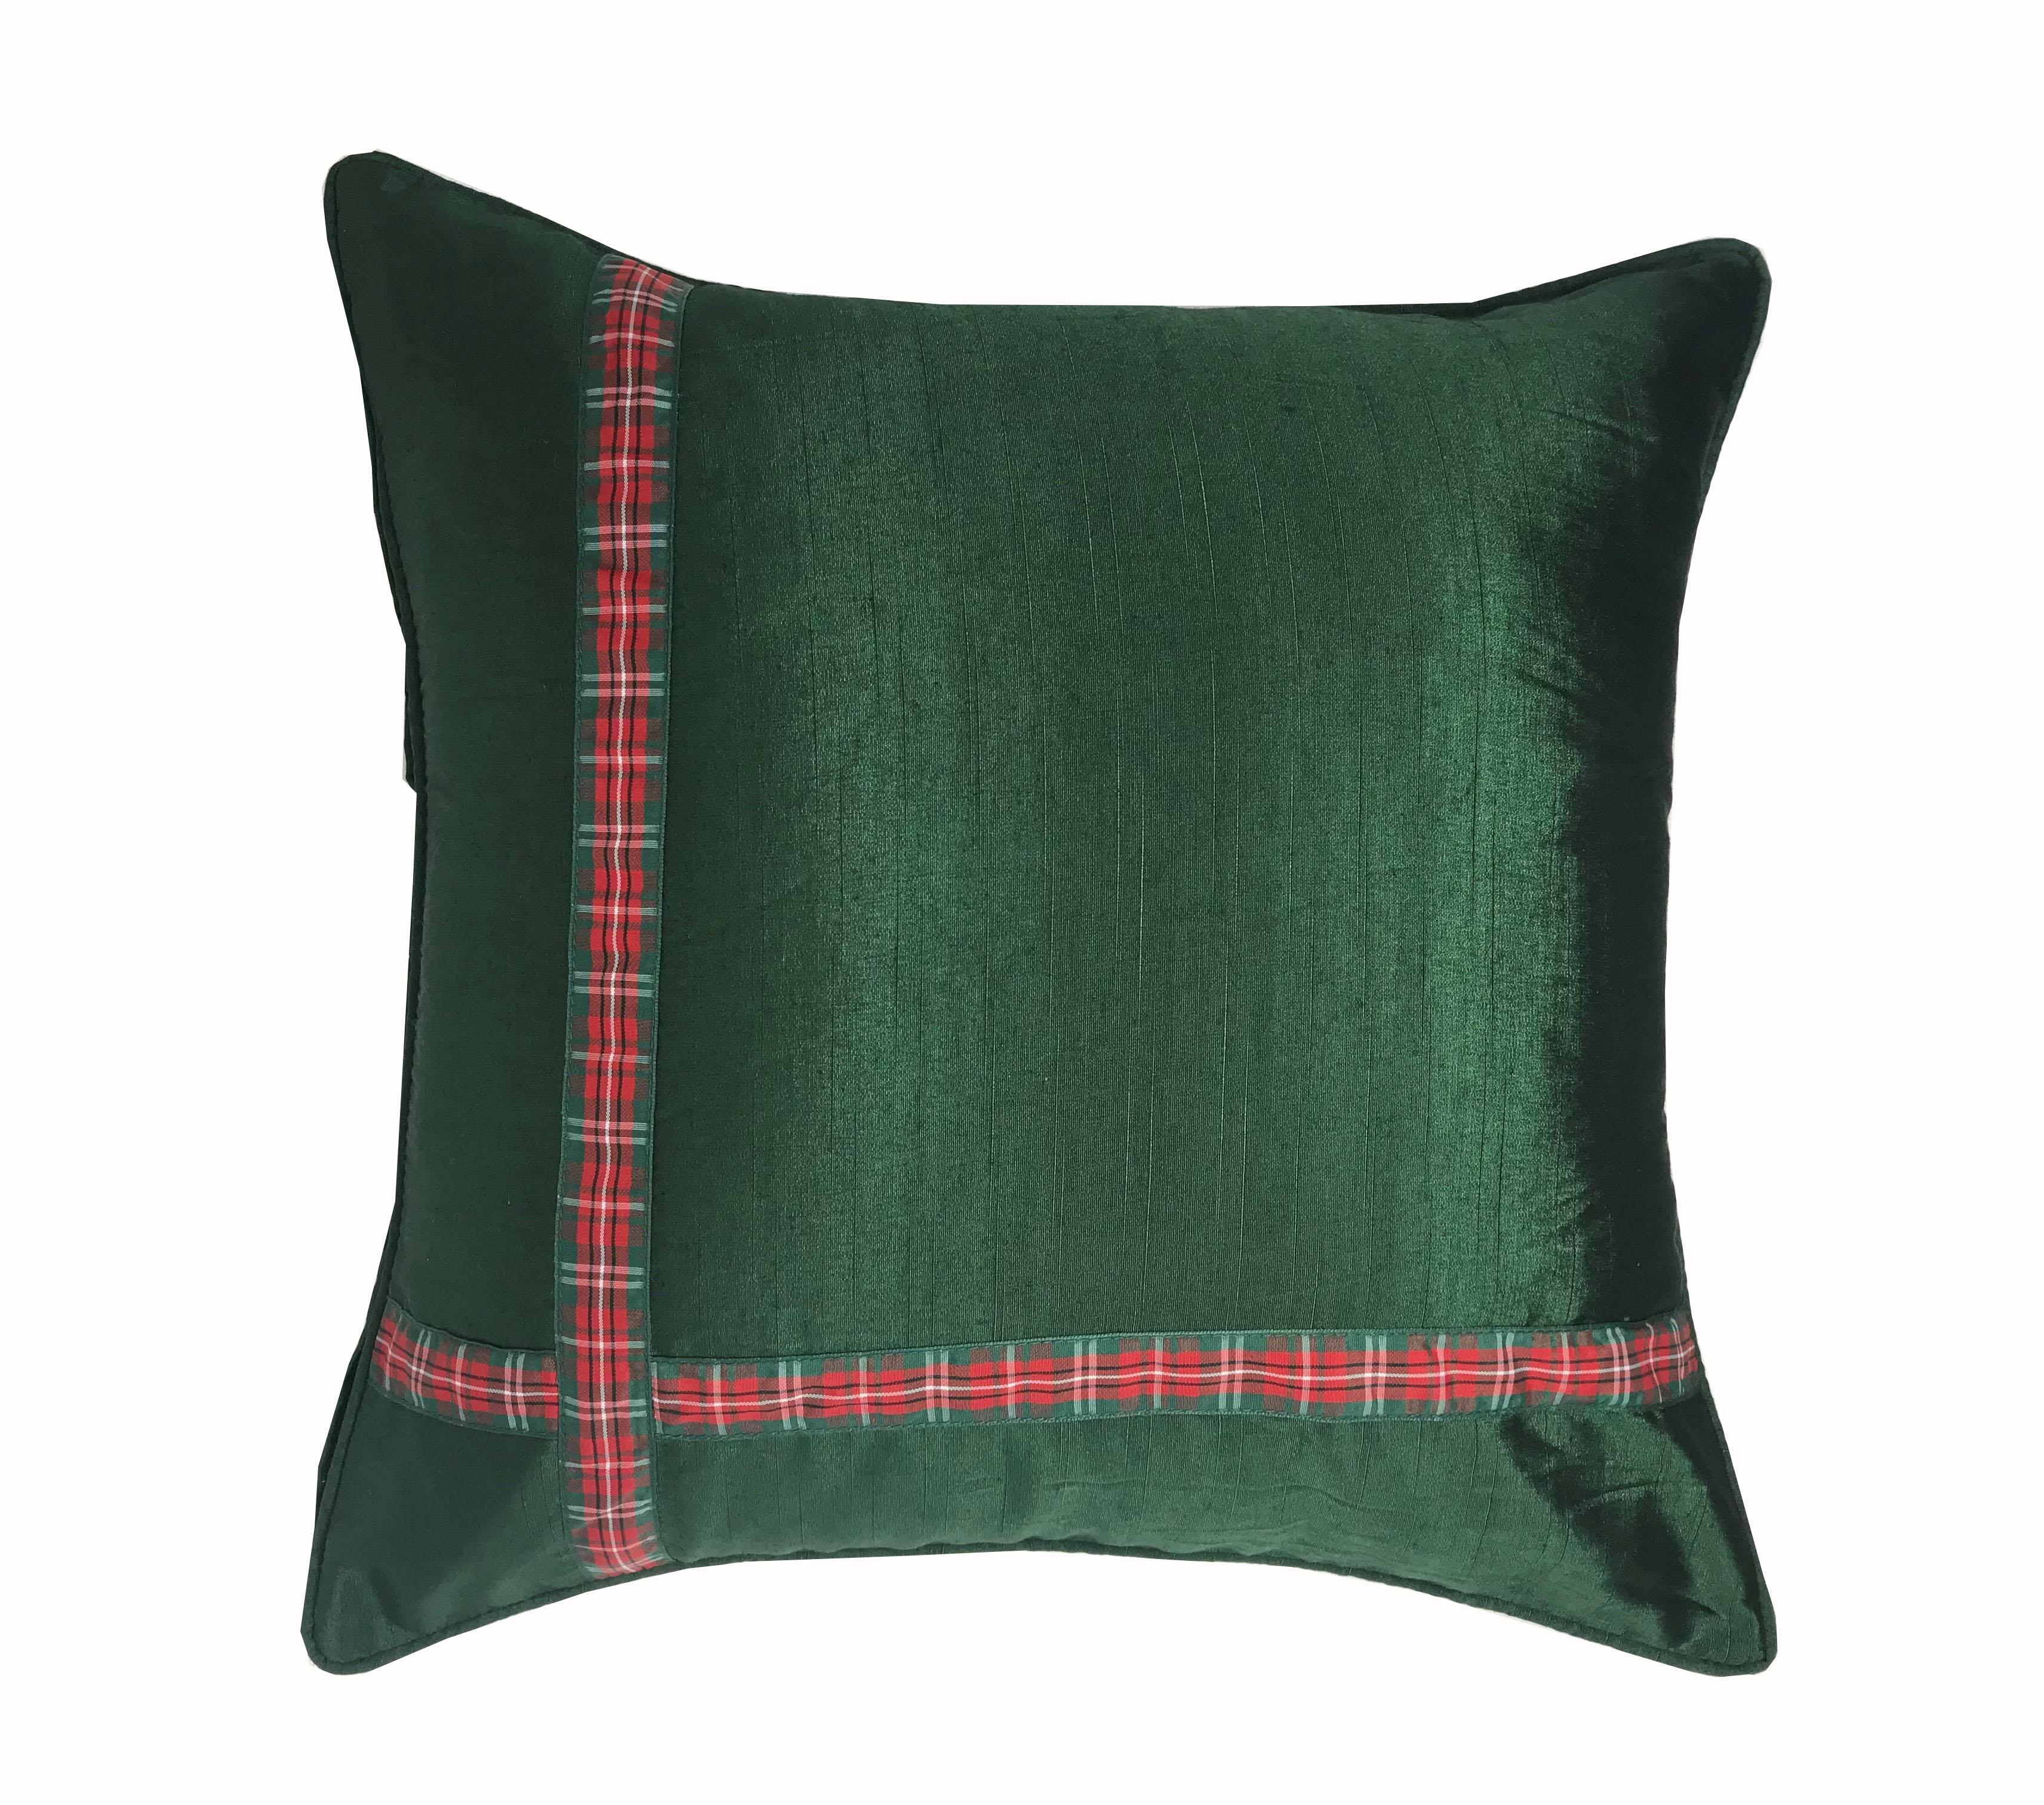 Xmas Ribbon Green 43cm x 43cm Cushion Cover Only